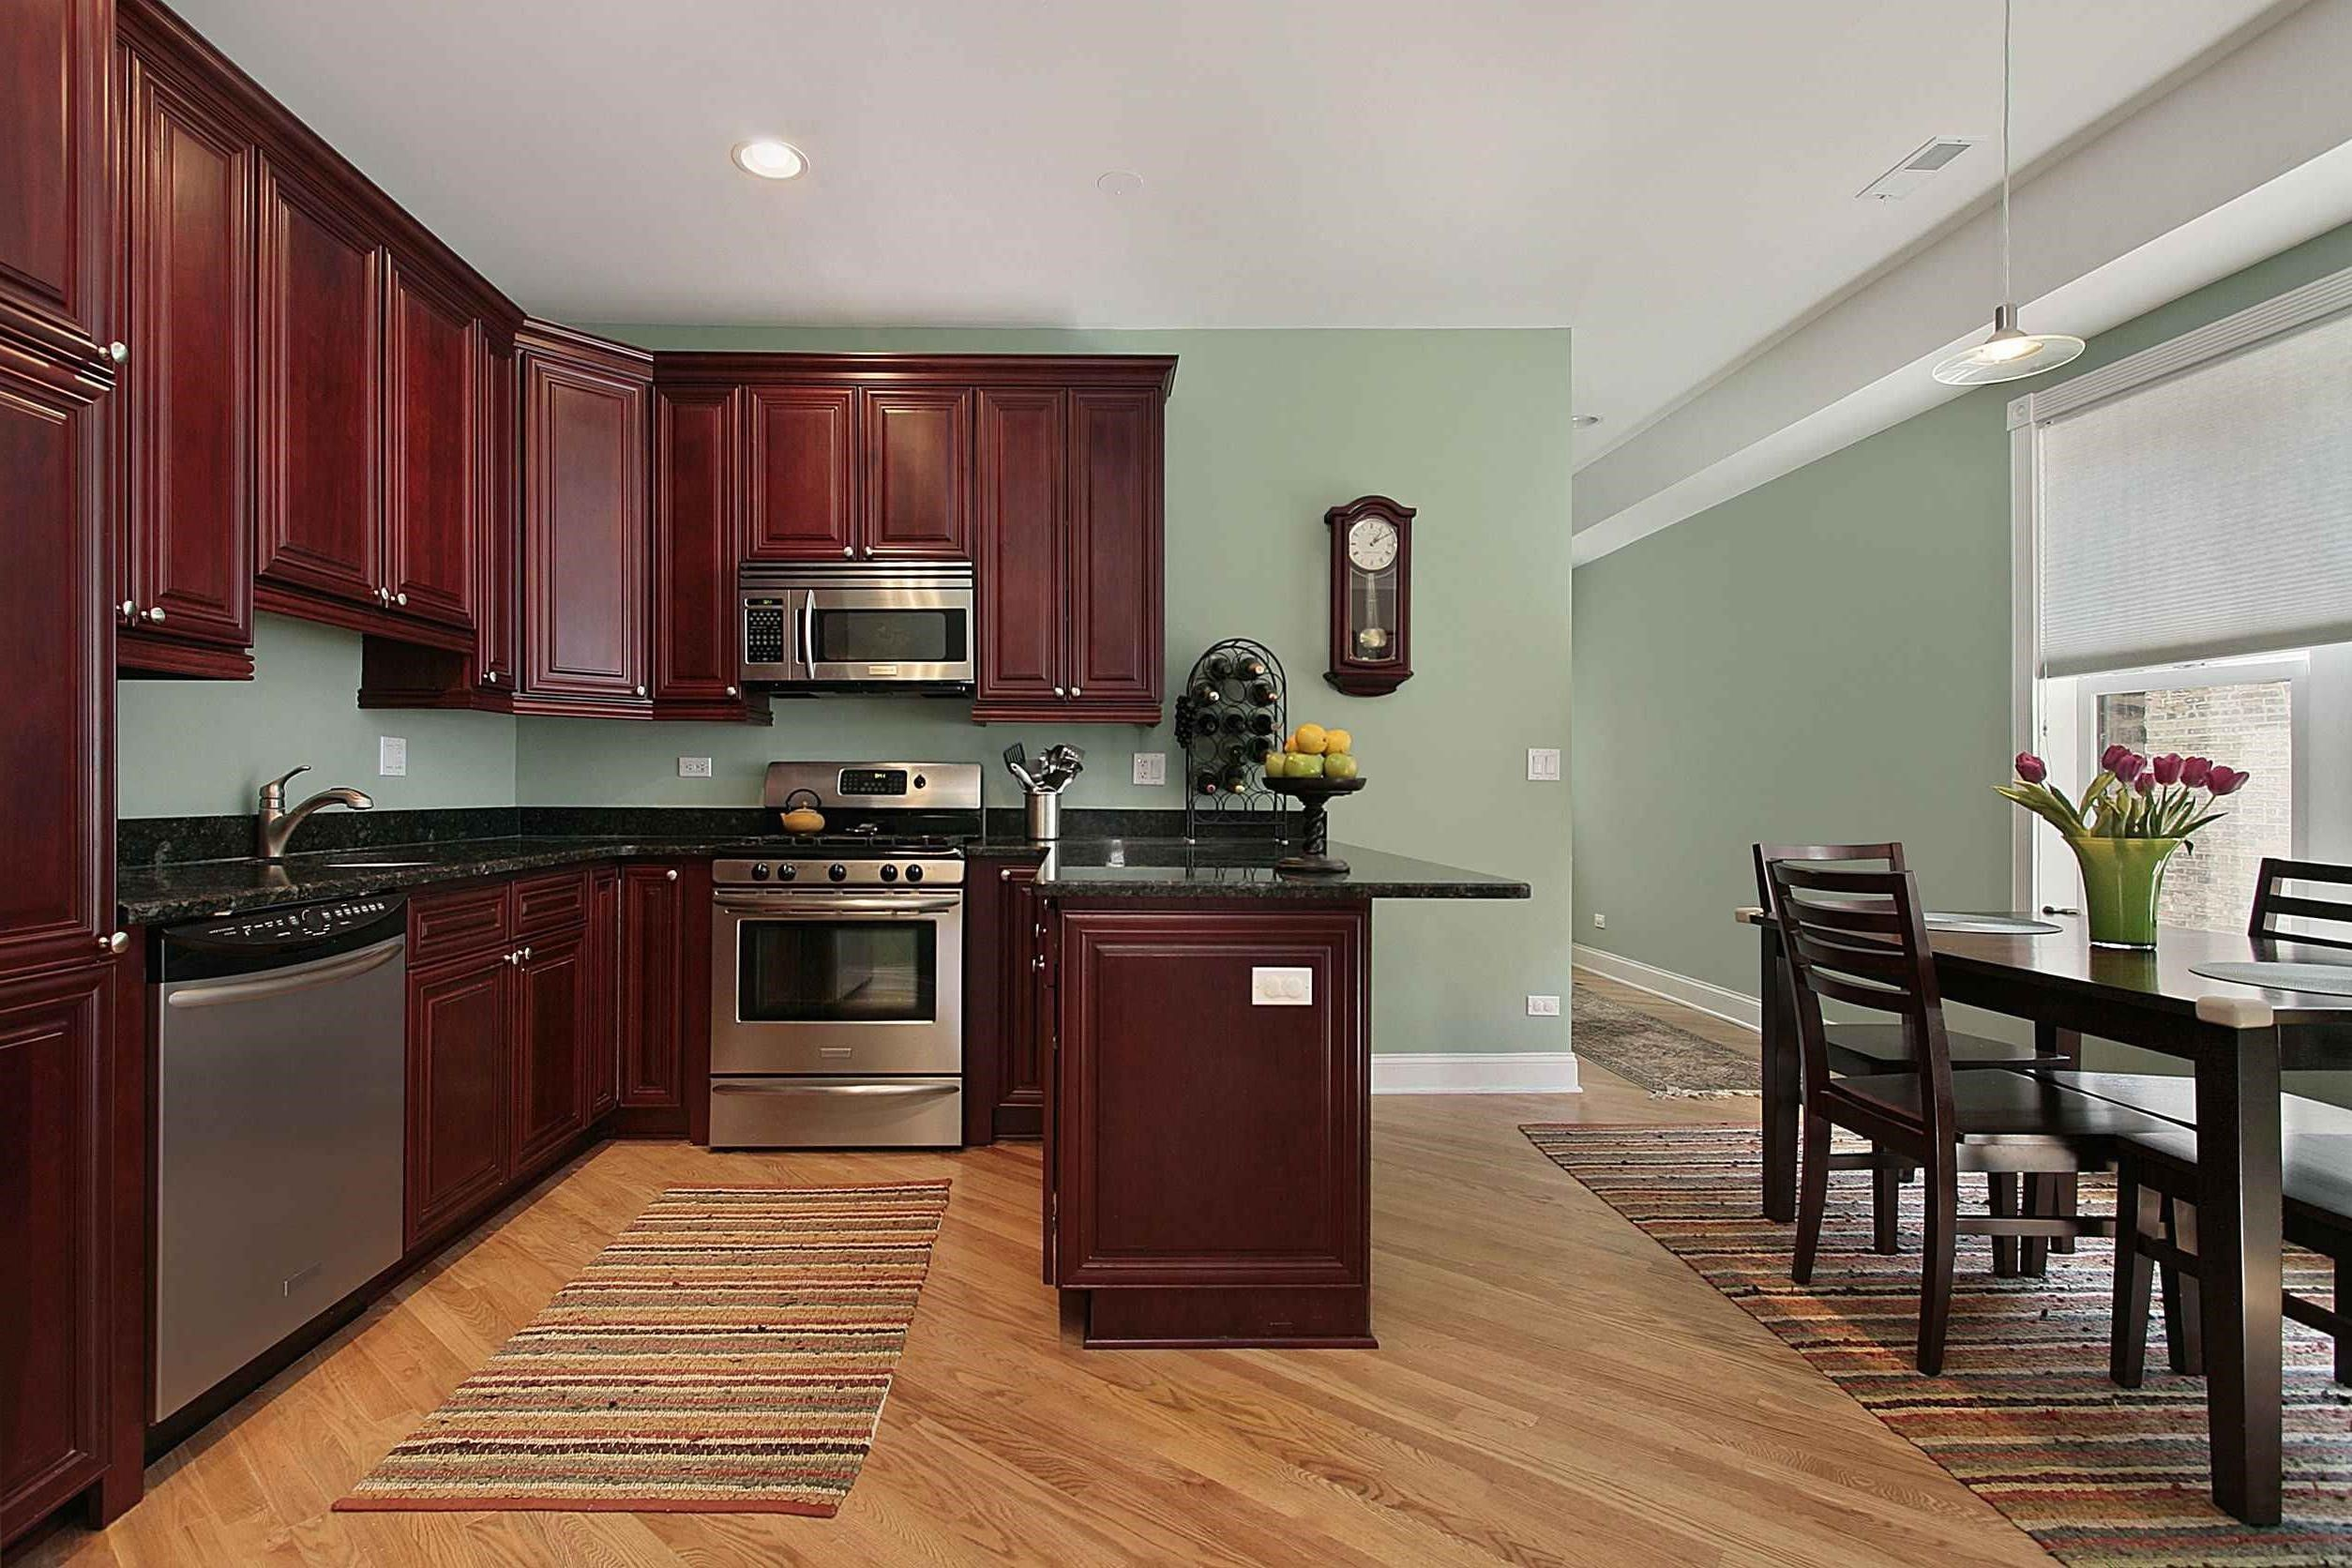 Image result for light green kitchen walls